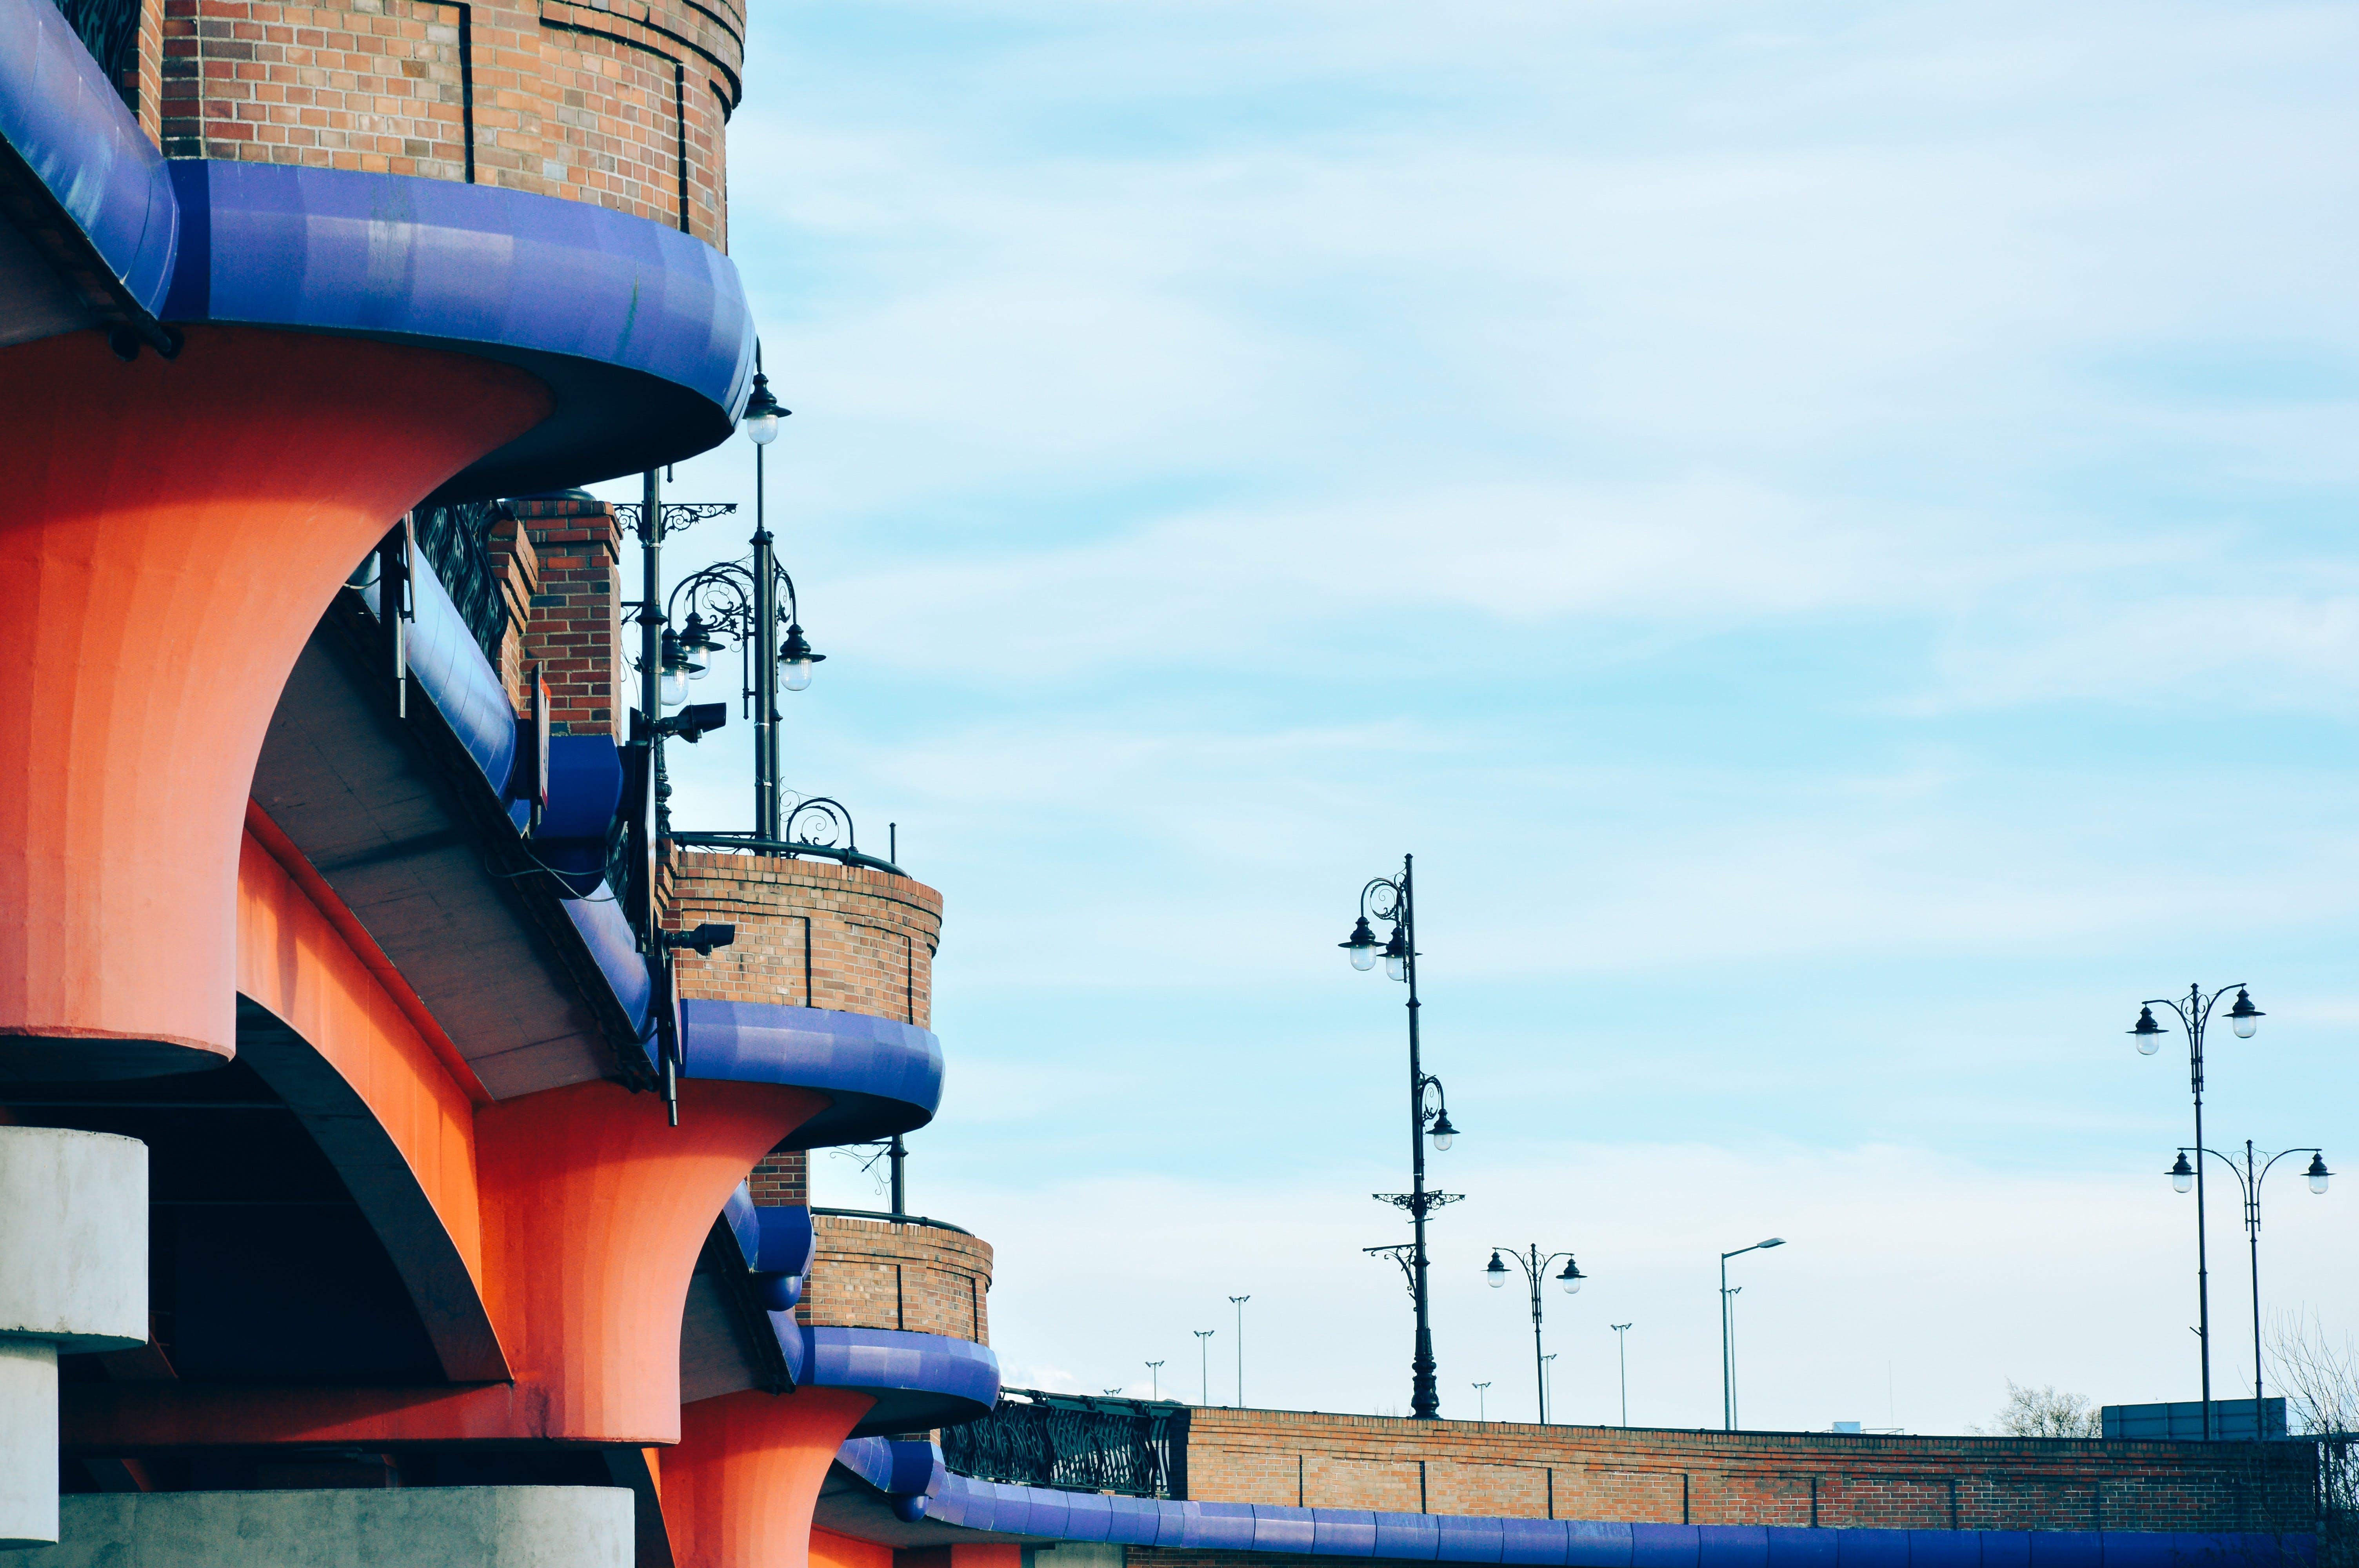 Brown, Blue, and Orange Building